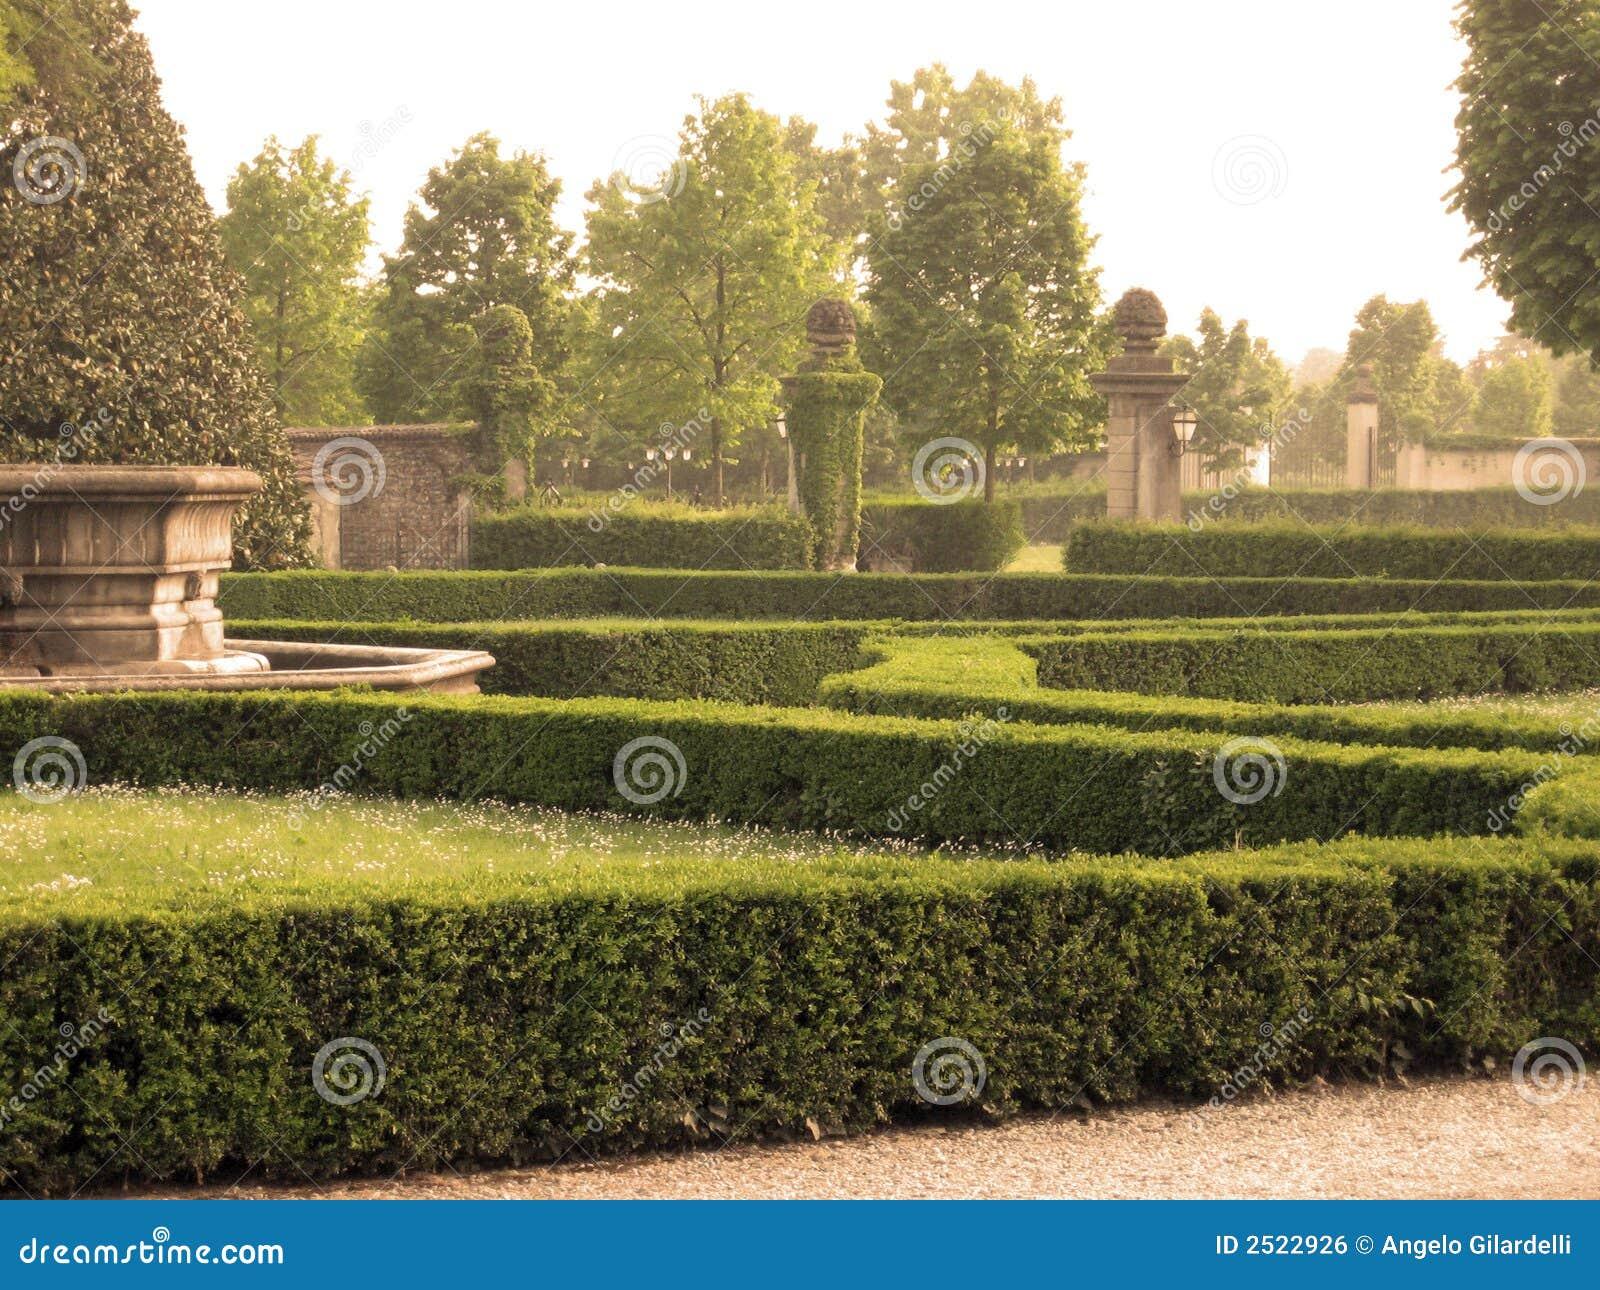 Italian neoclassic garden stock photo. Image of park, italy - 2522926